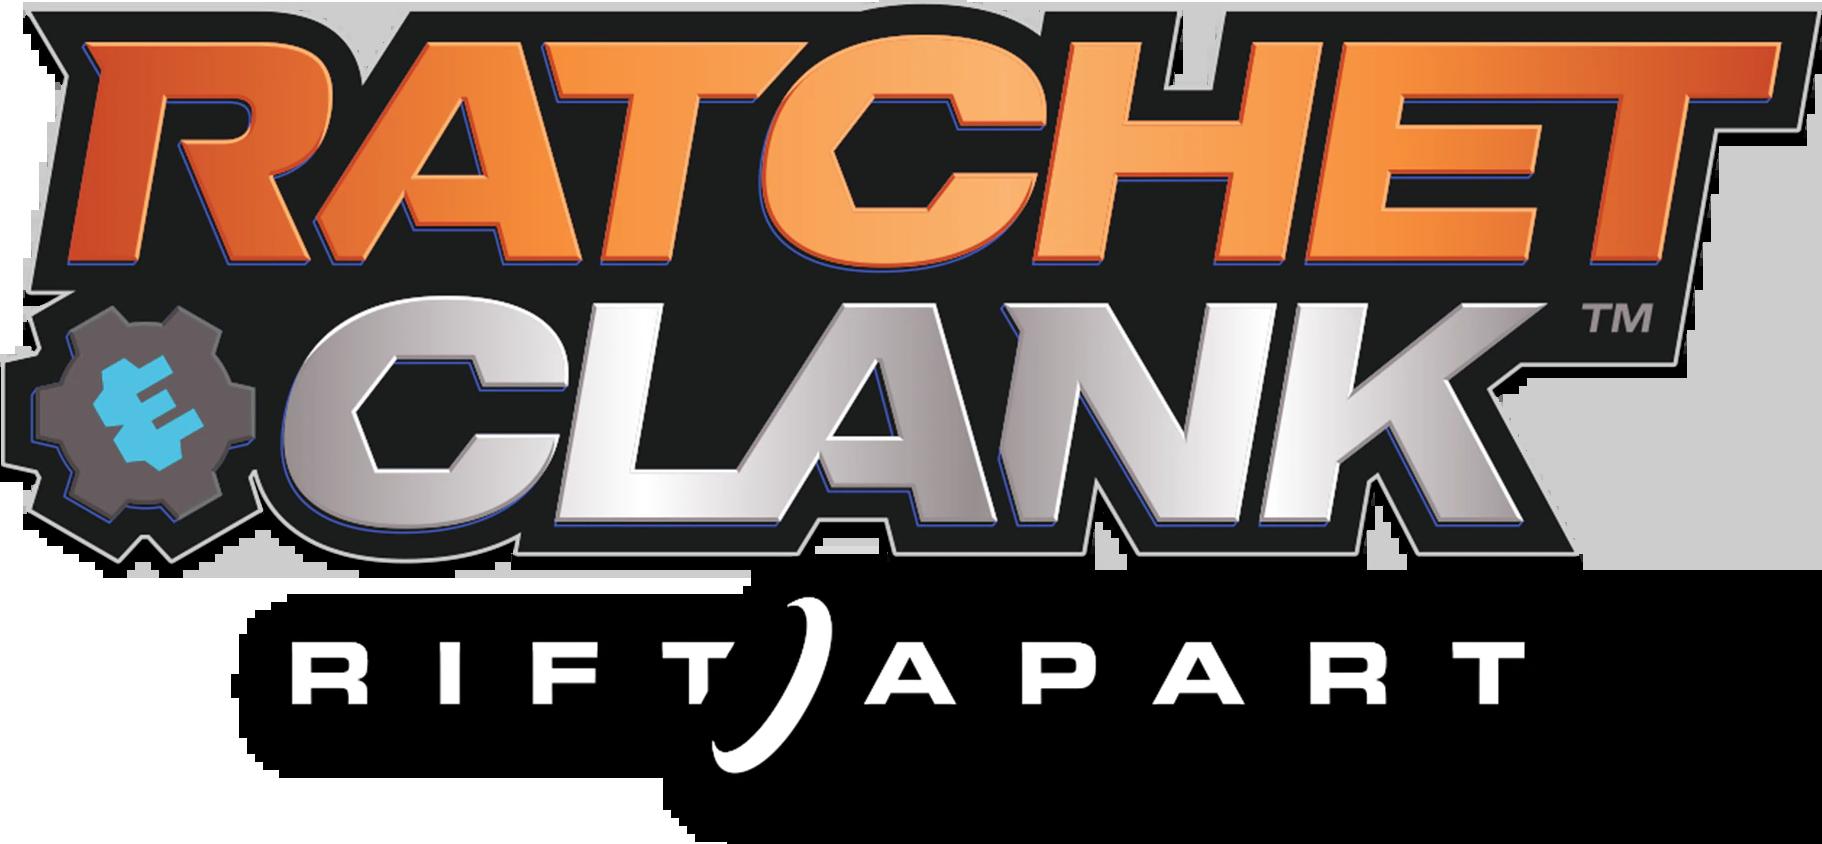 Ratchet Clank Rift Apart Ratchet Clank Wiki Fandom